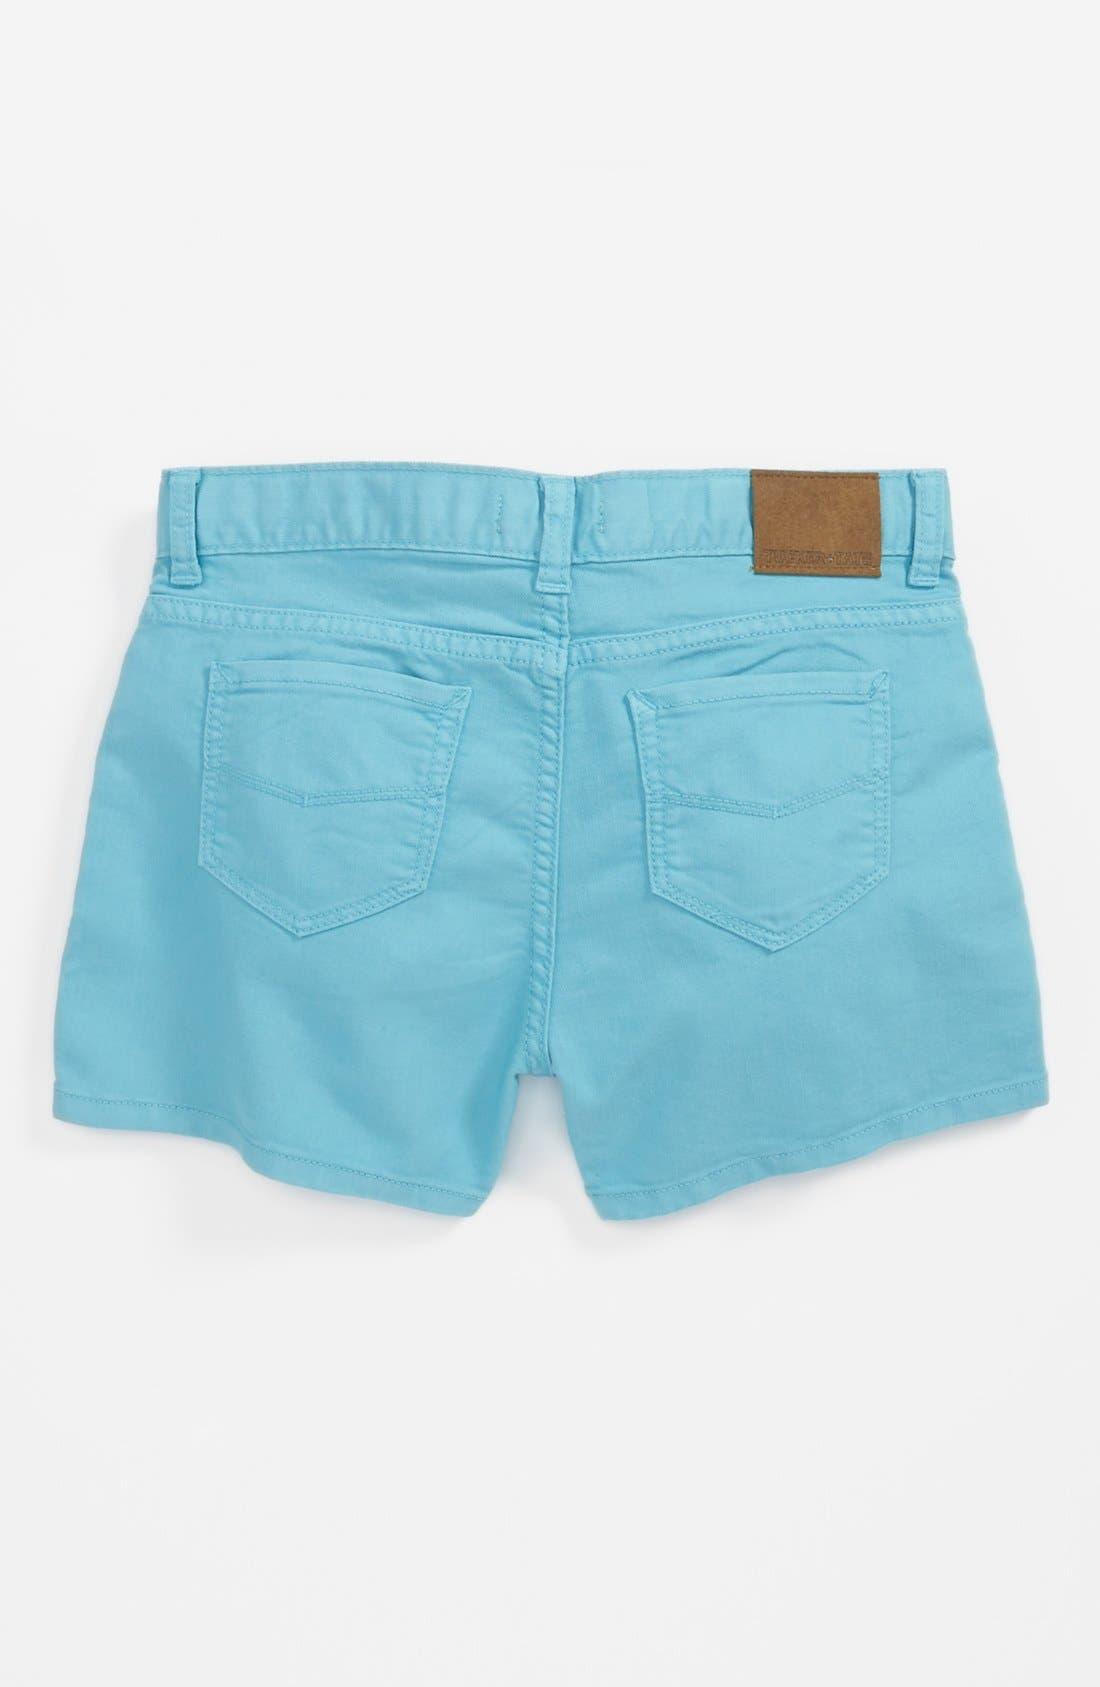 Alternate Image 1 Selected - Tucker + Tate 'Abbie' Denim Shorts (Big Girls)